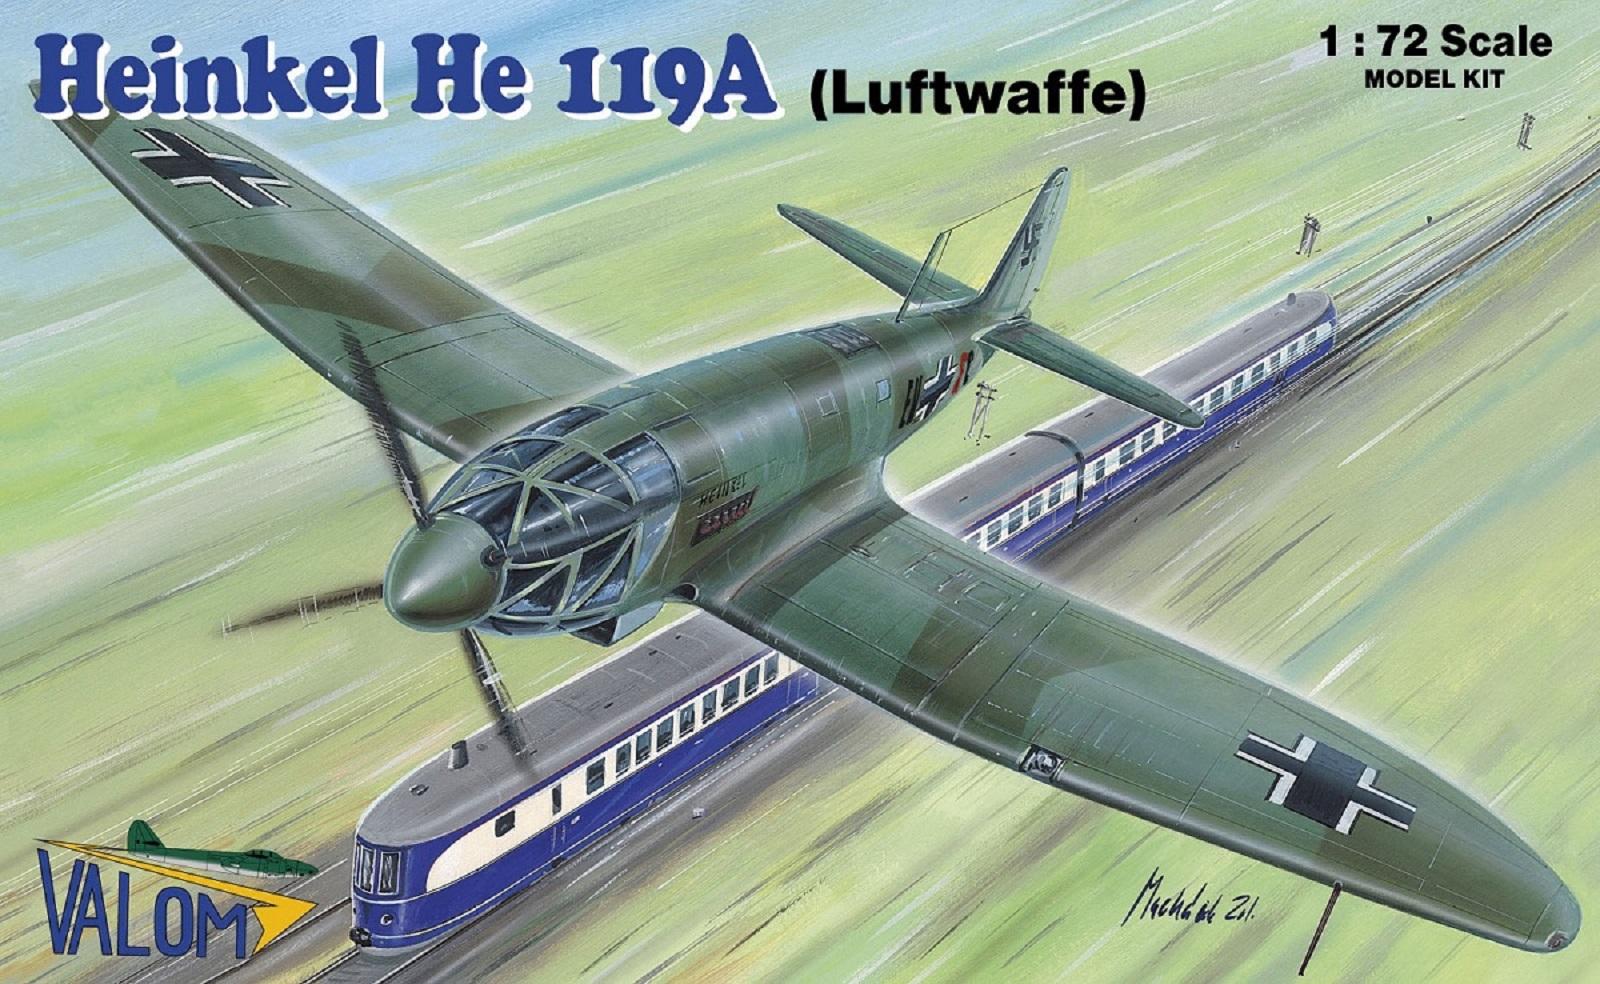 Valom Heinkel He 119A (Luftwaffe)